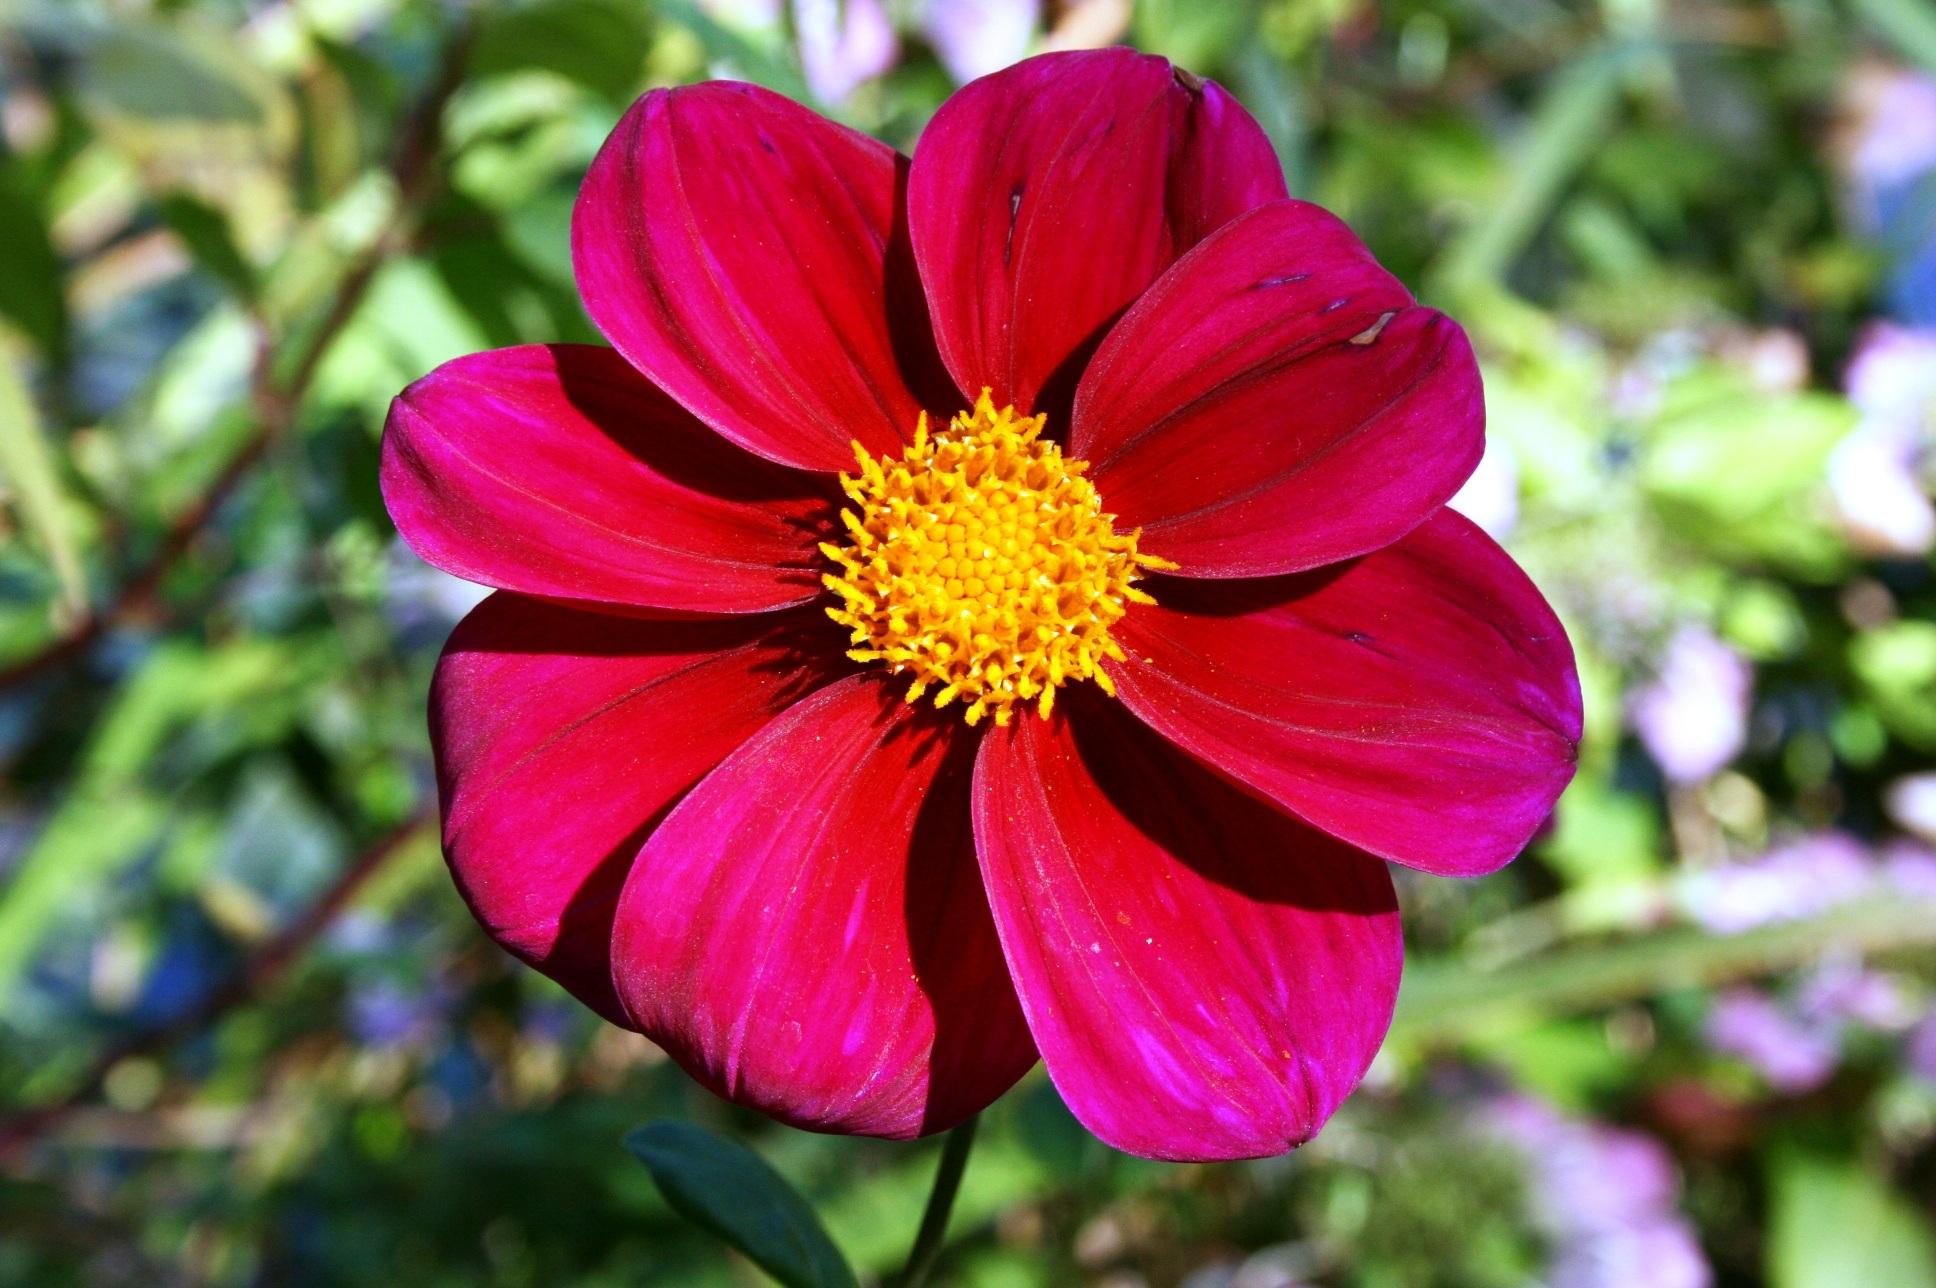 Fotos Gratis P 233 Talo Bot 225 Nica Flora Flor Silvestre